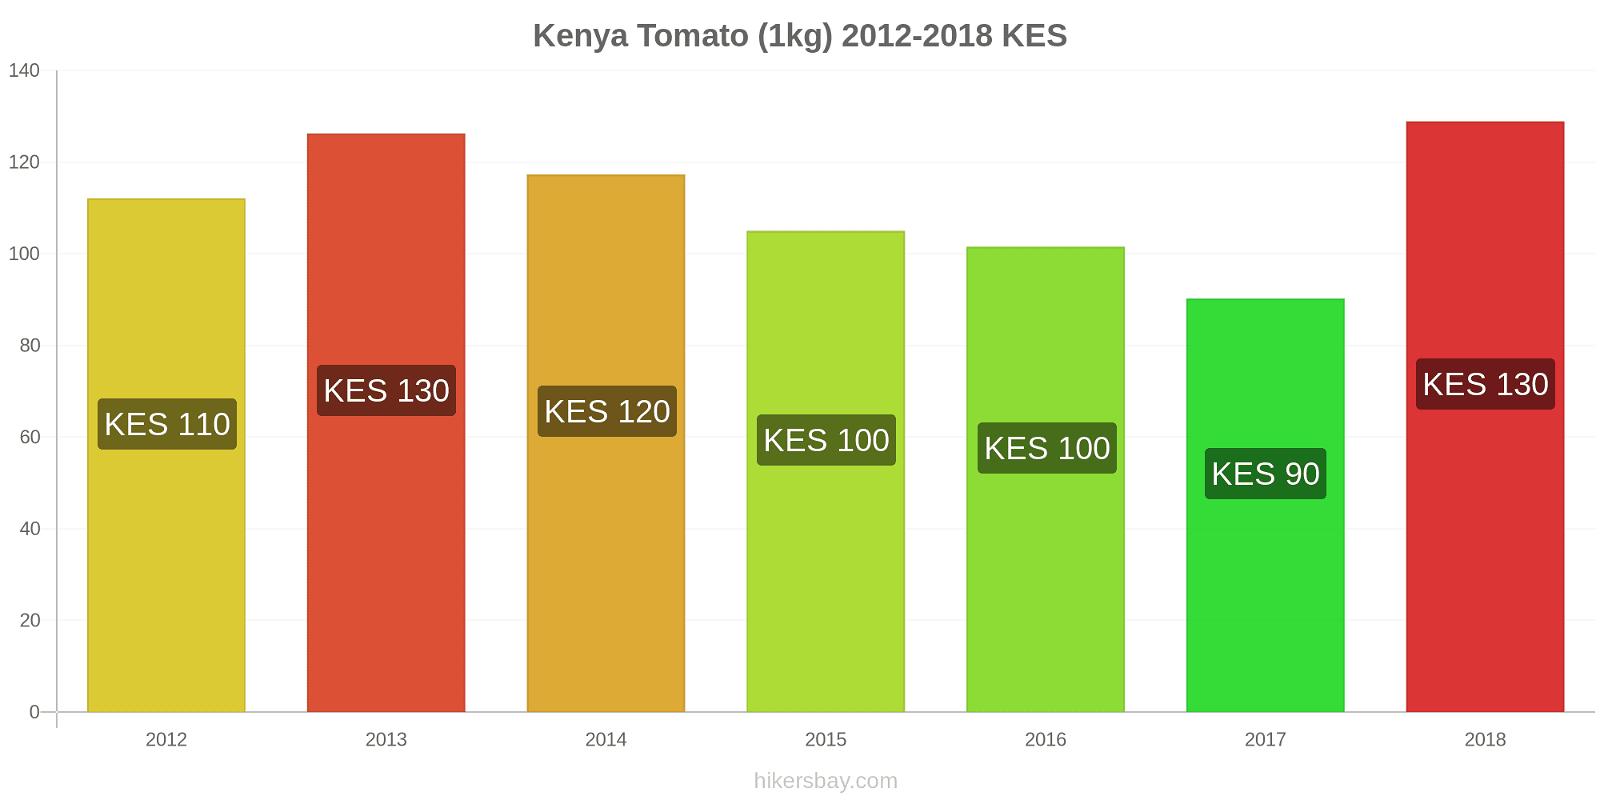 Kenya price changes Tomato (1kg) hikersbay.com